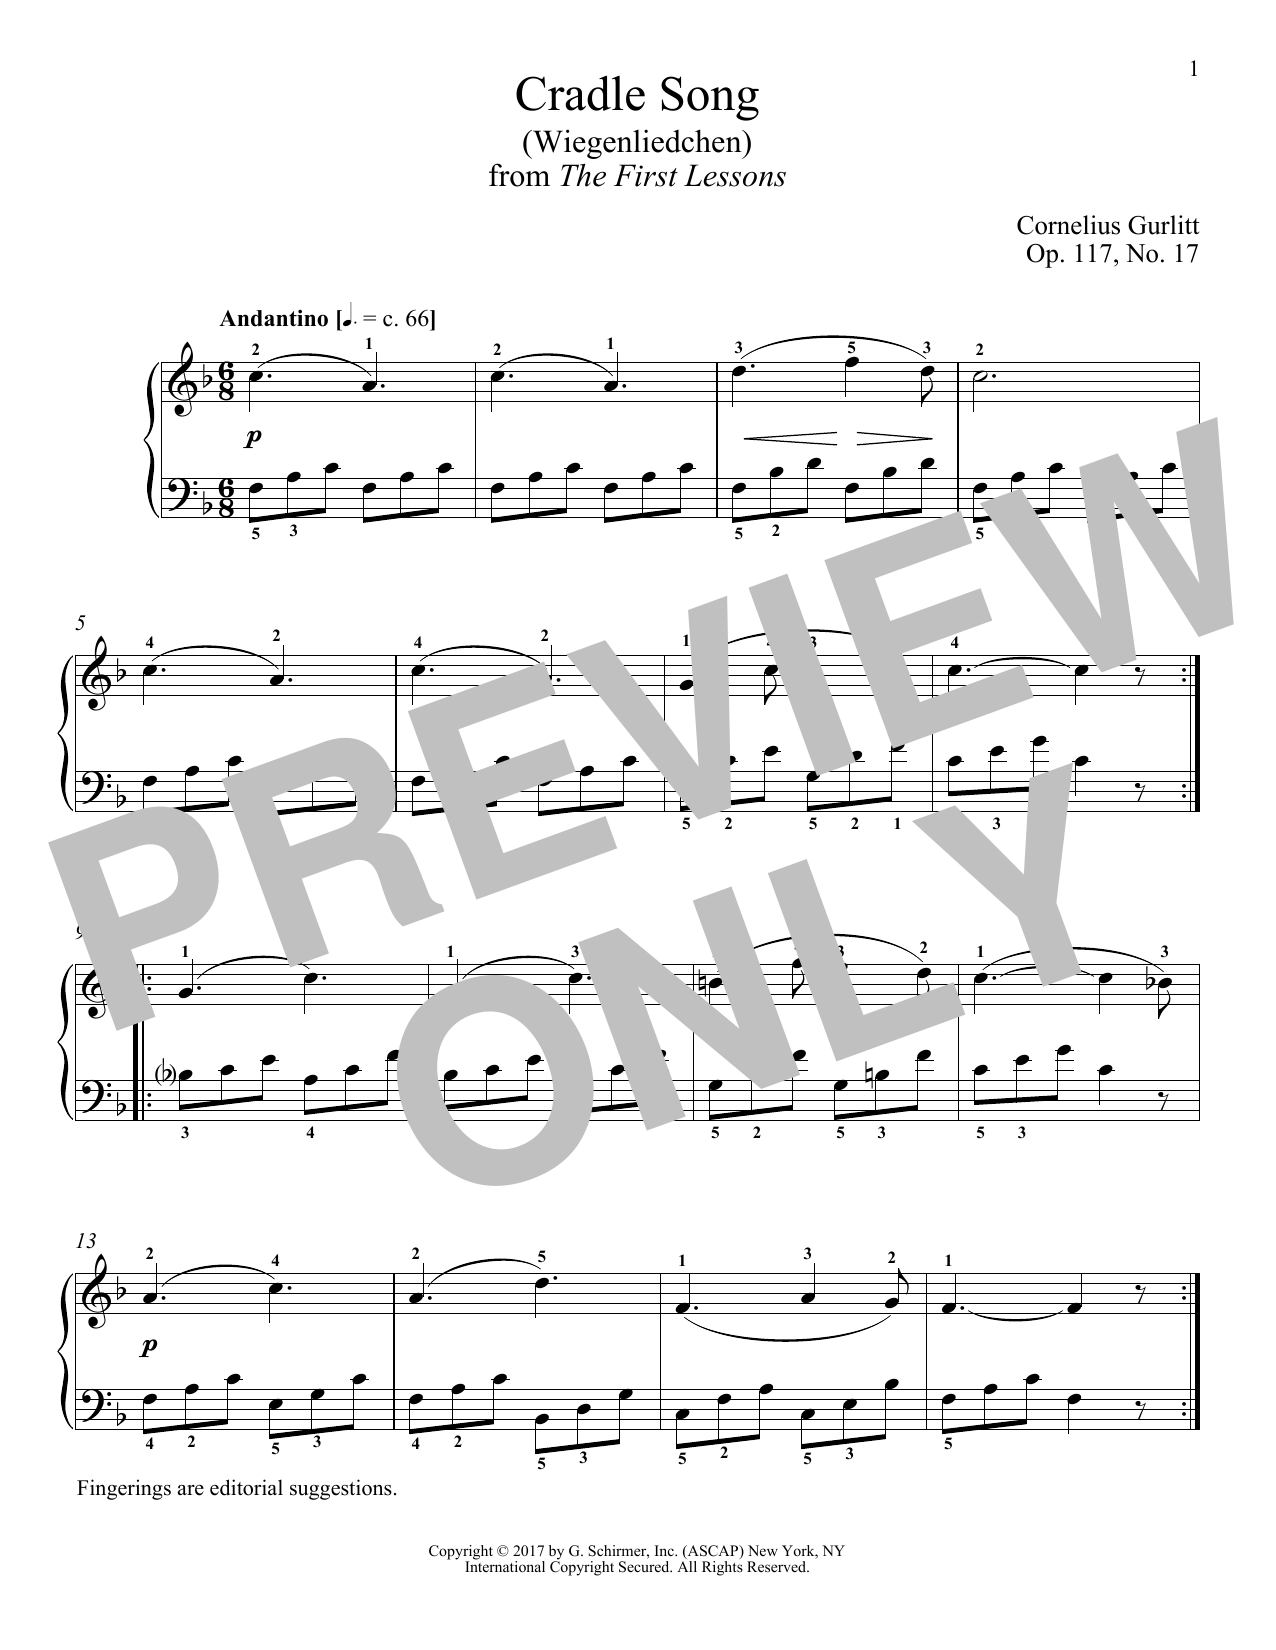 Cornelius Gurlitt Cradle Song (Wiegenliedchen), Op. 117, No. 17 sheet music notes and chords